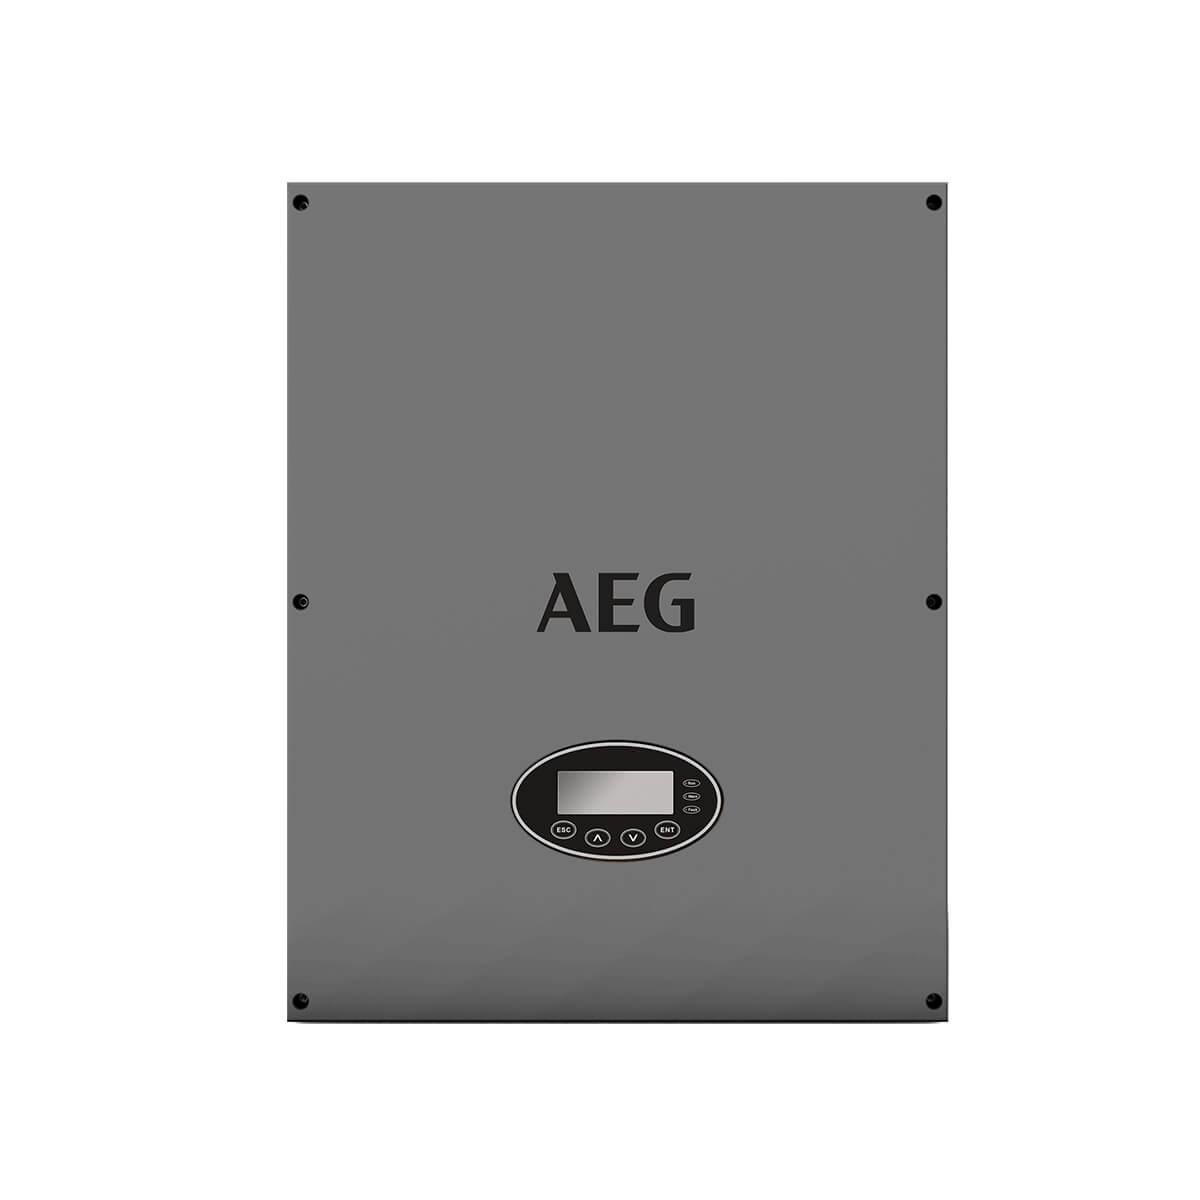 aeg 15kW inverter, aeg as-ic01 15kW inverter, aeg as-ic01-15000-2 inverter, aeg as-ic01-15000-2, aeg as-ic01 15kW, AEG 15 KW